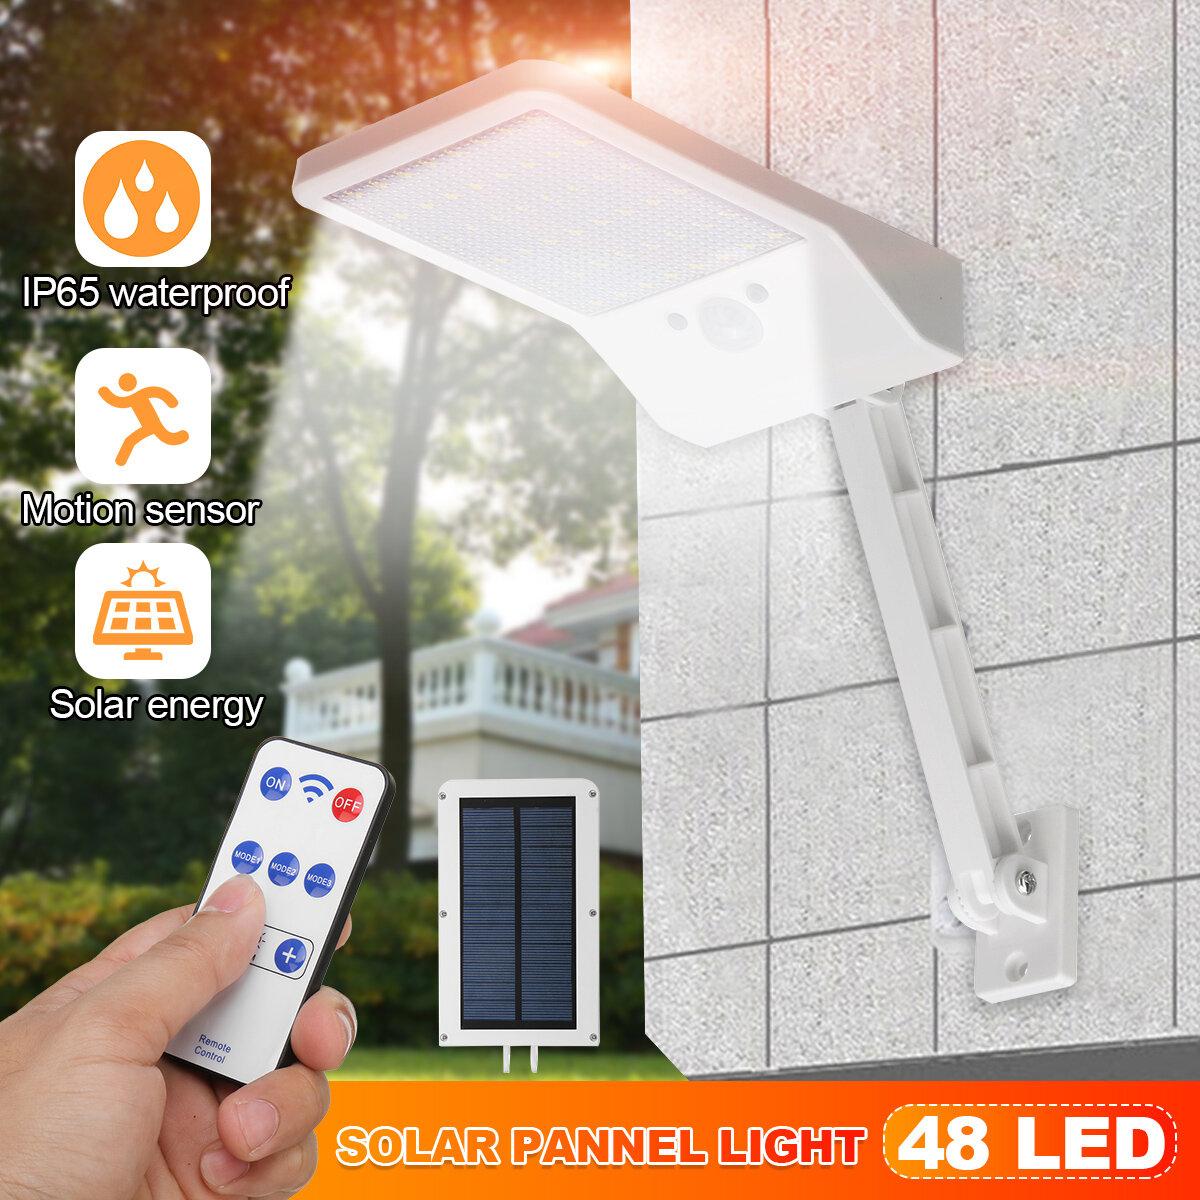 Motion Sensor PIR Bright 48 LED Solar Wall Power Light Garden Outdoor Street Lamp+Remote Control